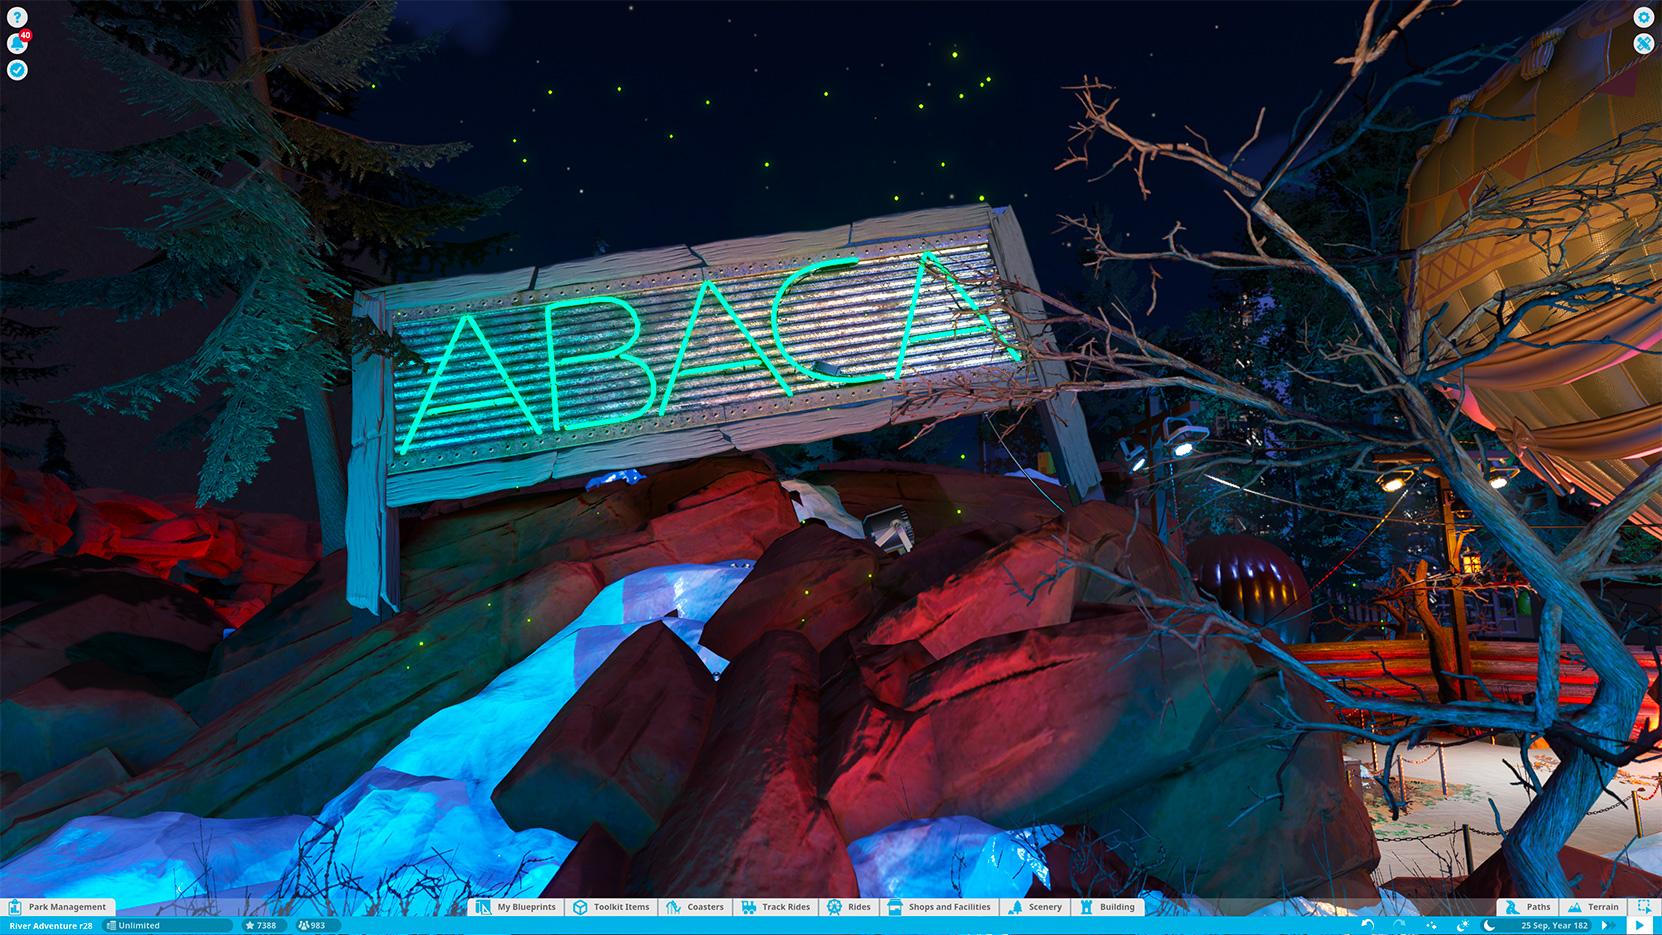 PlanCo-QVP-Screenshots-BatchA-0105.jpg